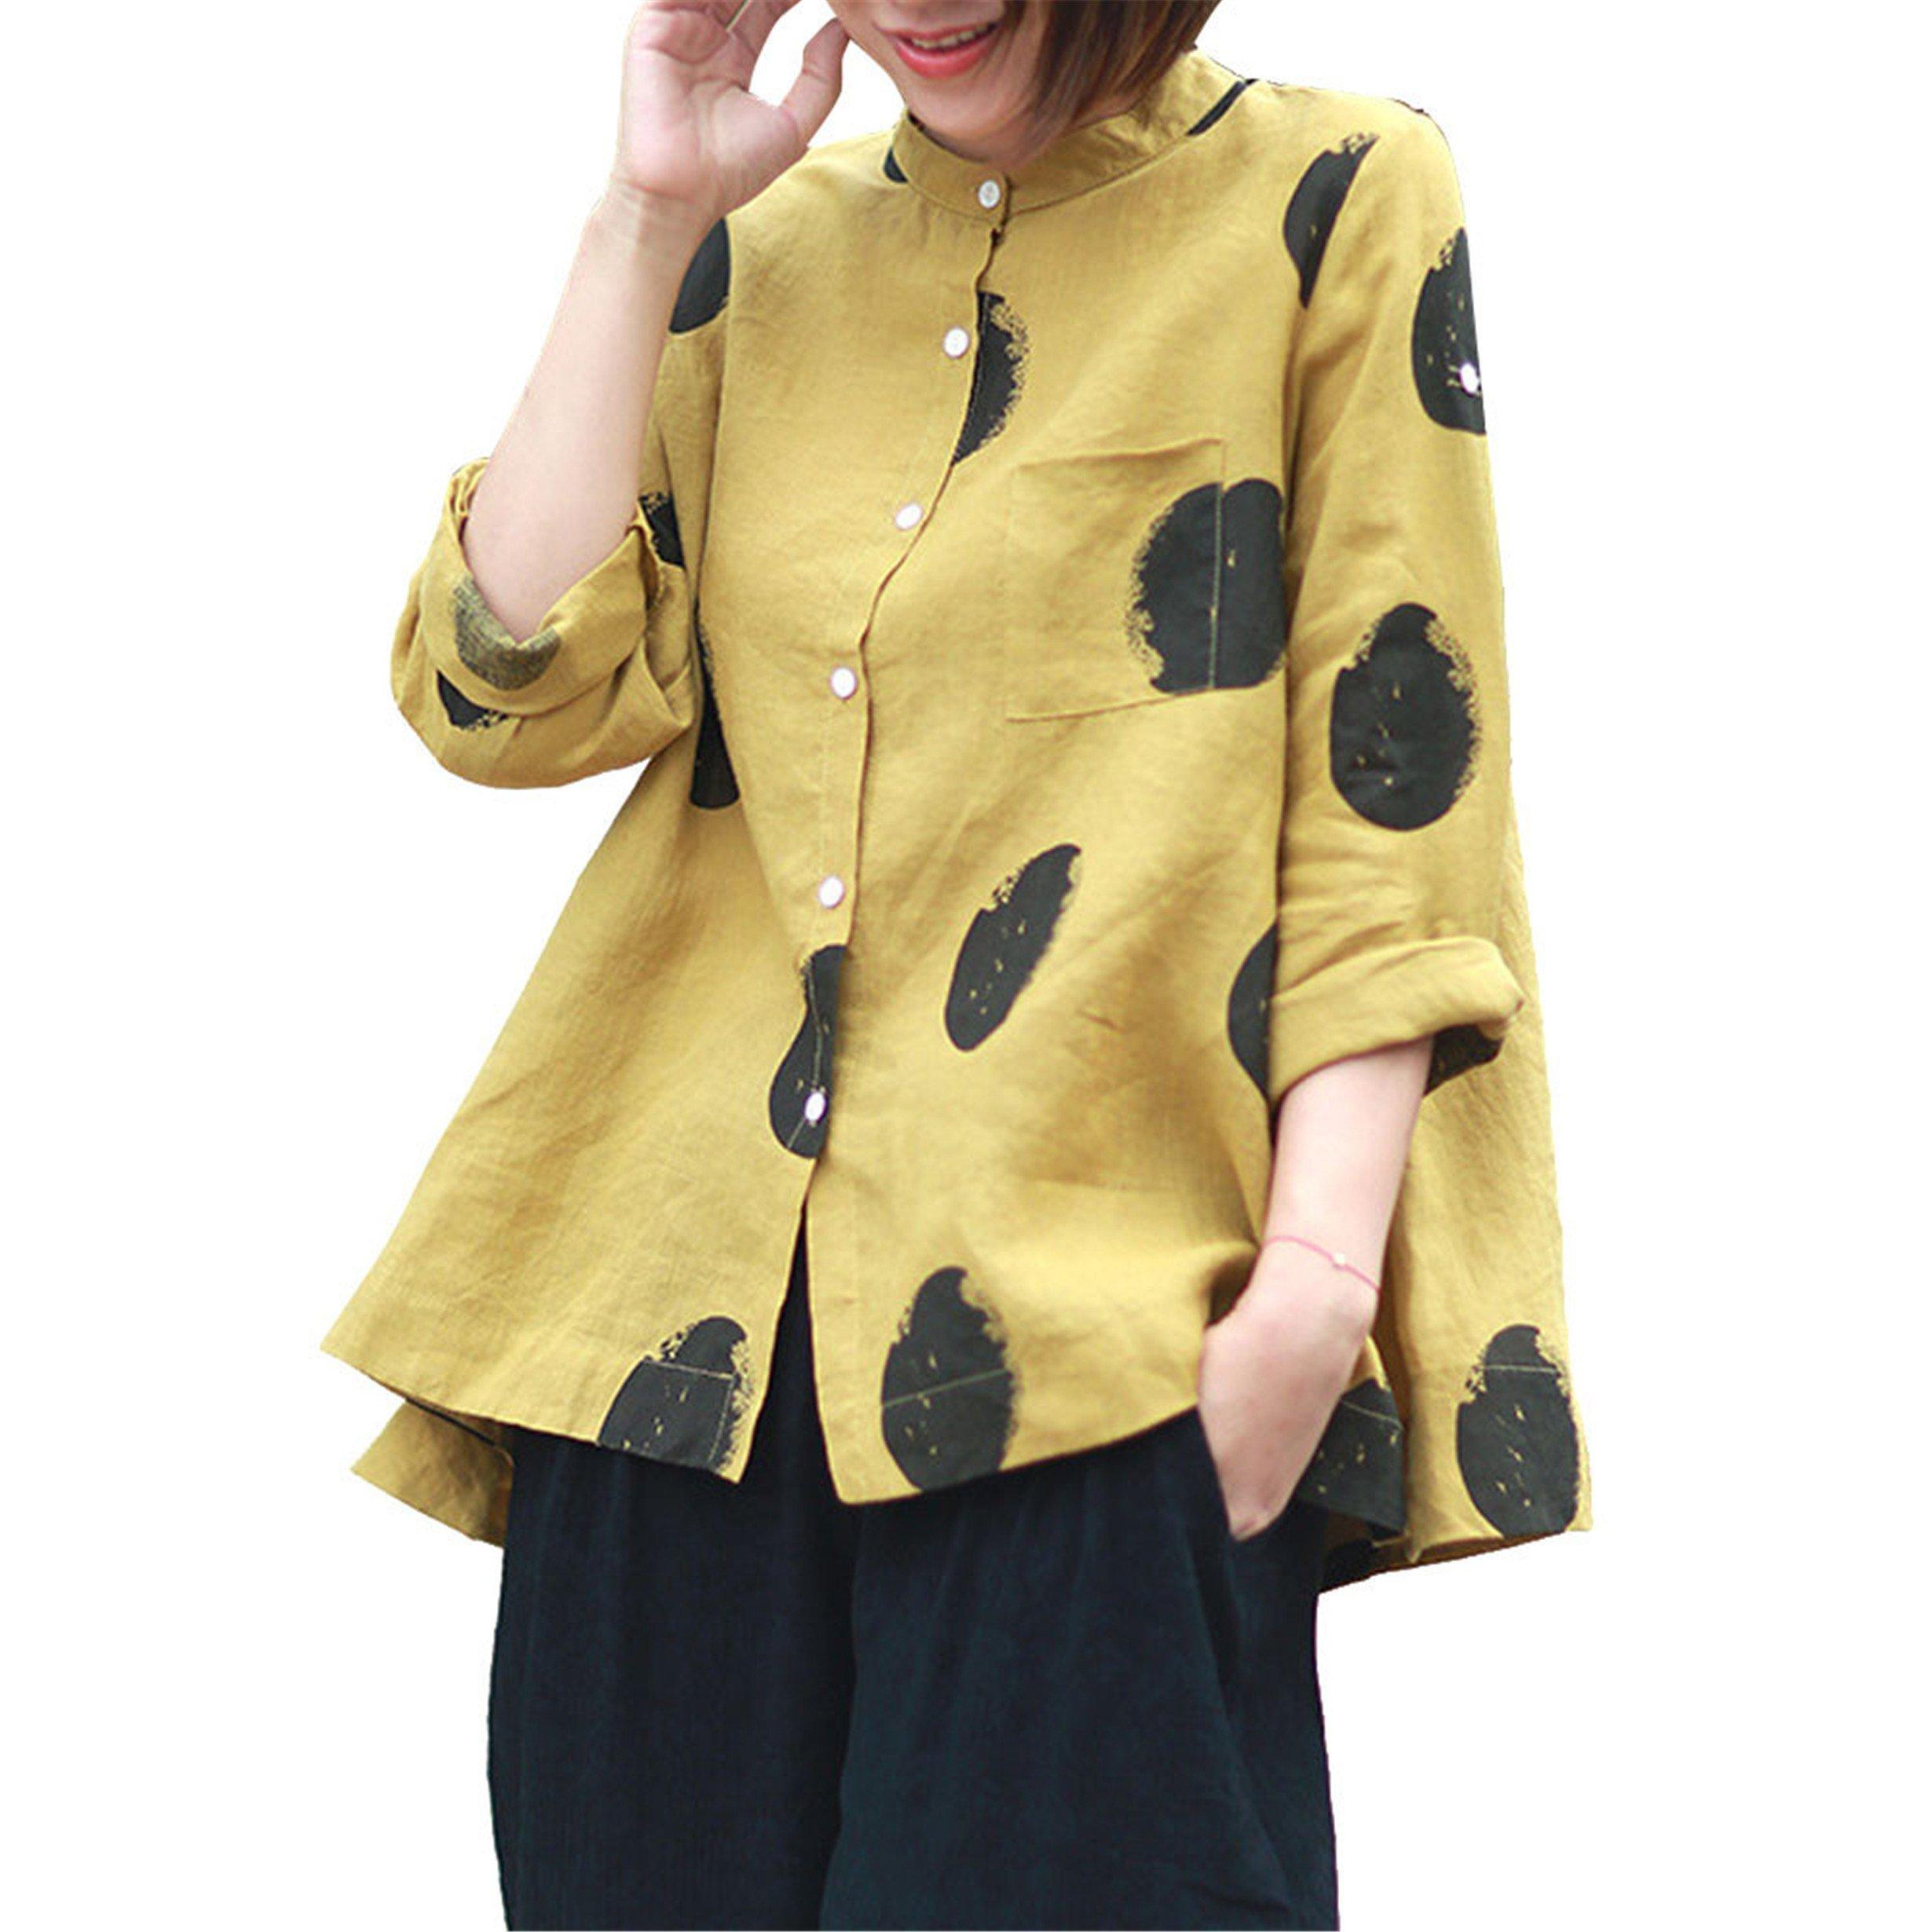 Londony ❤ Women's Button Down V Neck Polka Dot Shirts Loose Fitting Bat Short Sleeve Henley Shirts Front Tie Tops (Yellow_C, 4XL)